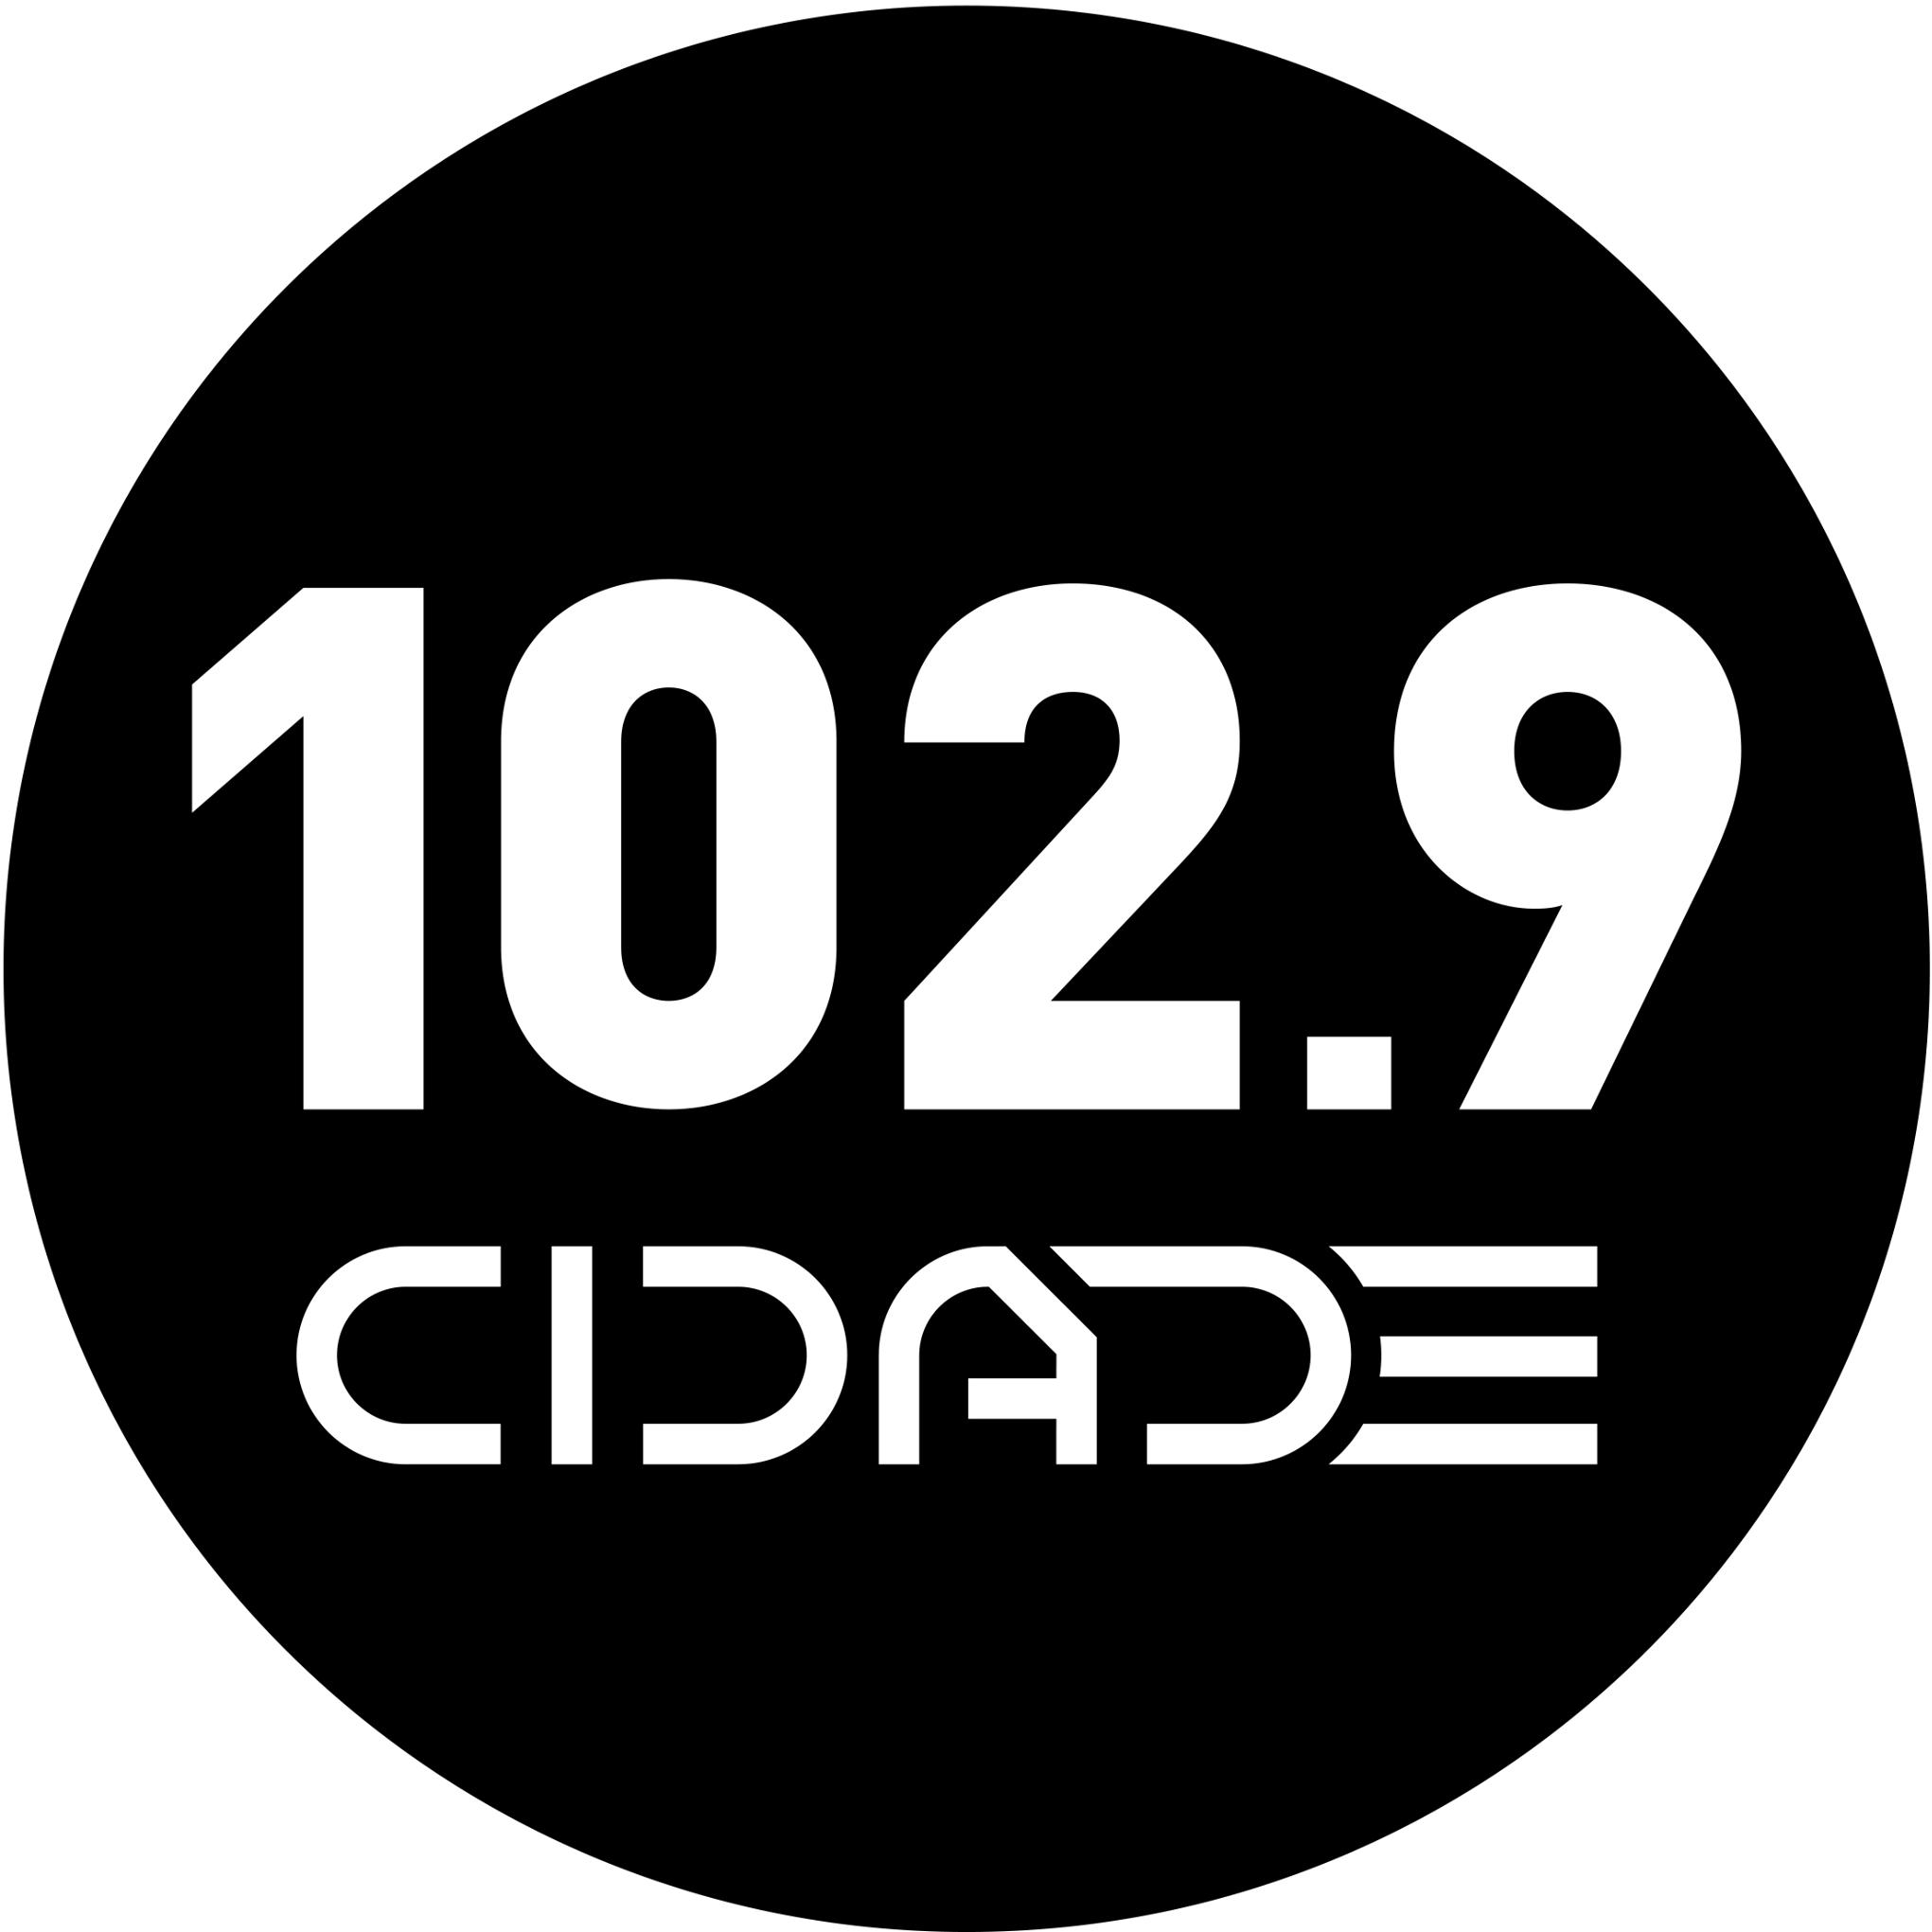 Радио Cidade 102.9 FM Бразилия, Рио-де-Жанейро